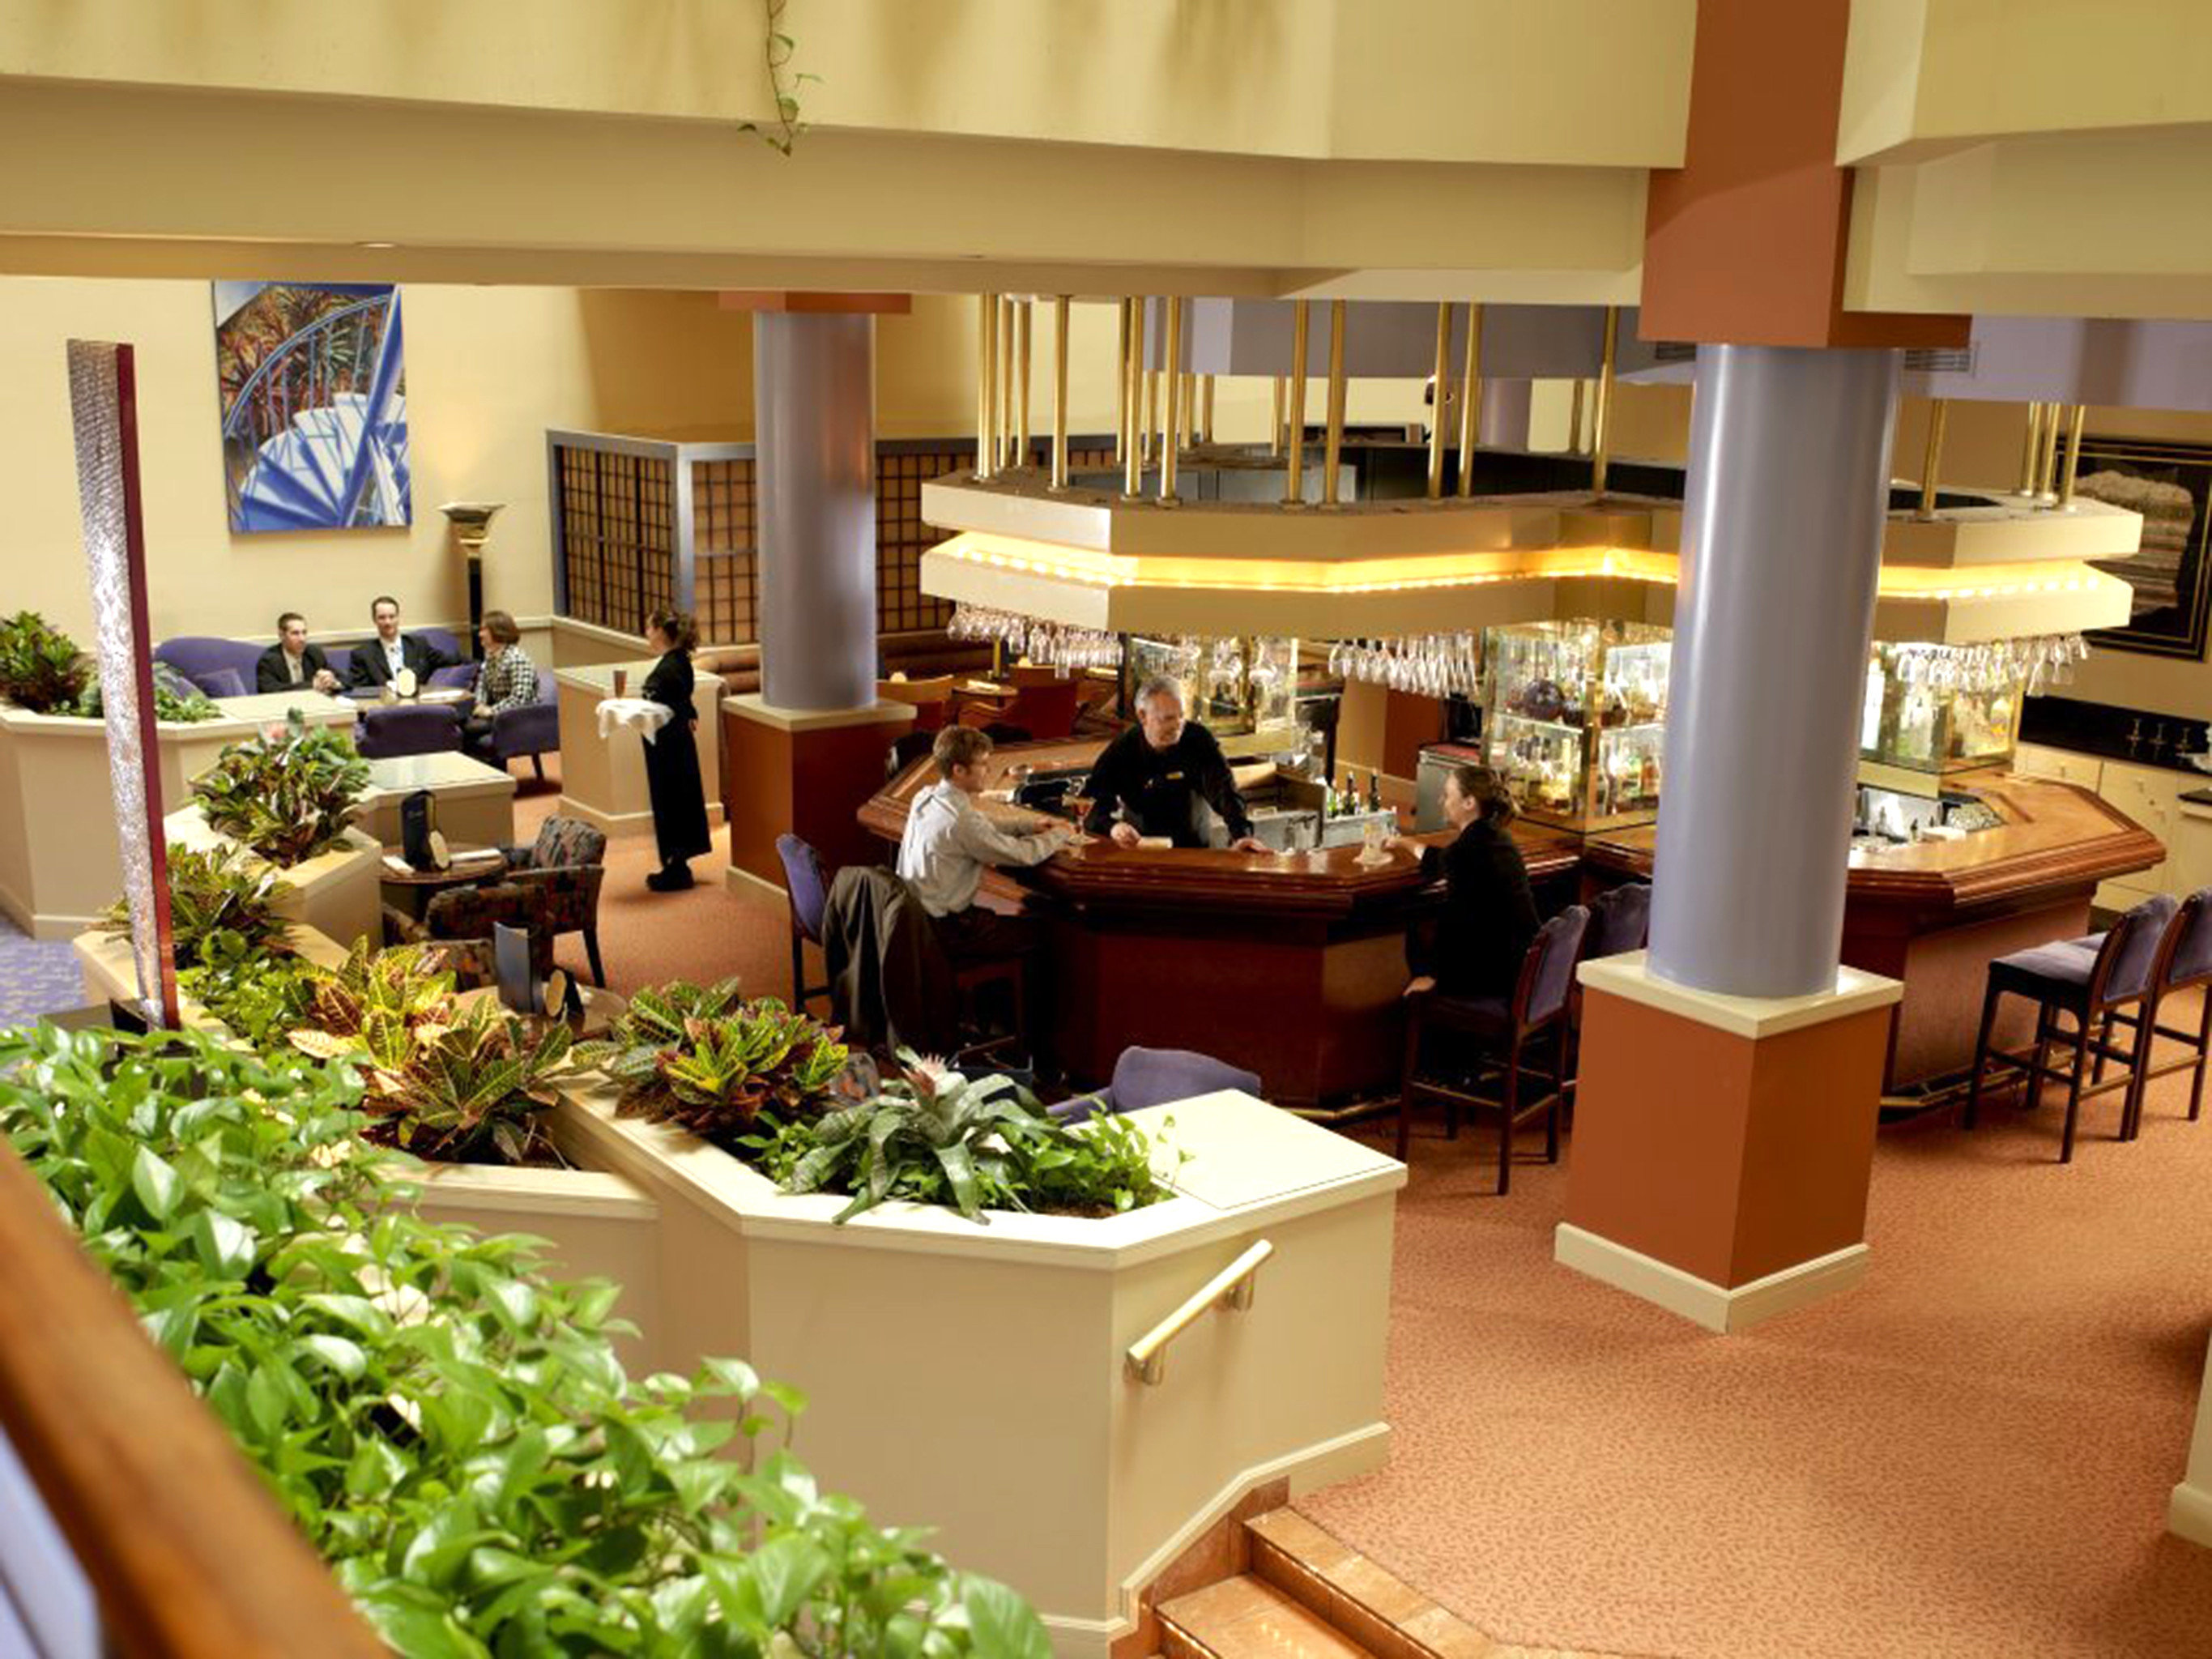 Bar Dining Drink Eat Elegant Historic Modern restaurant floristry brunch buffet home Resort food